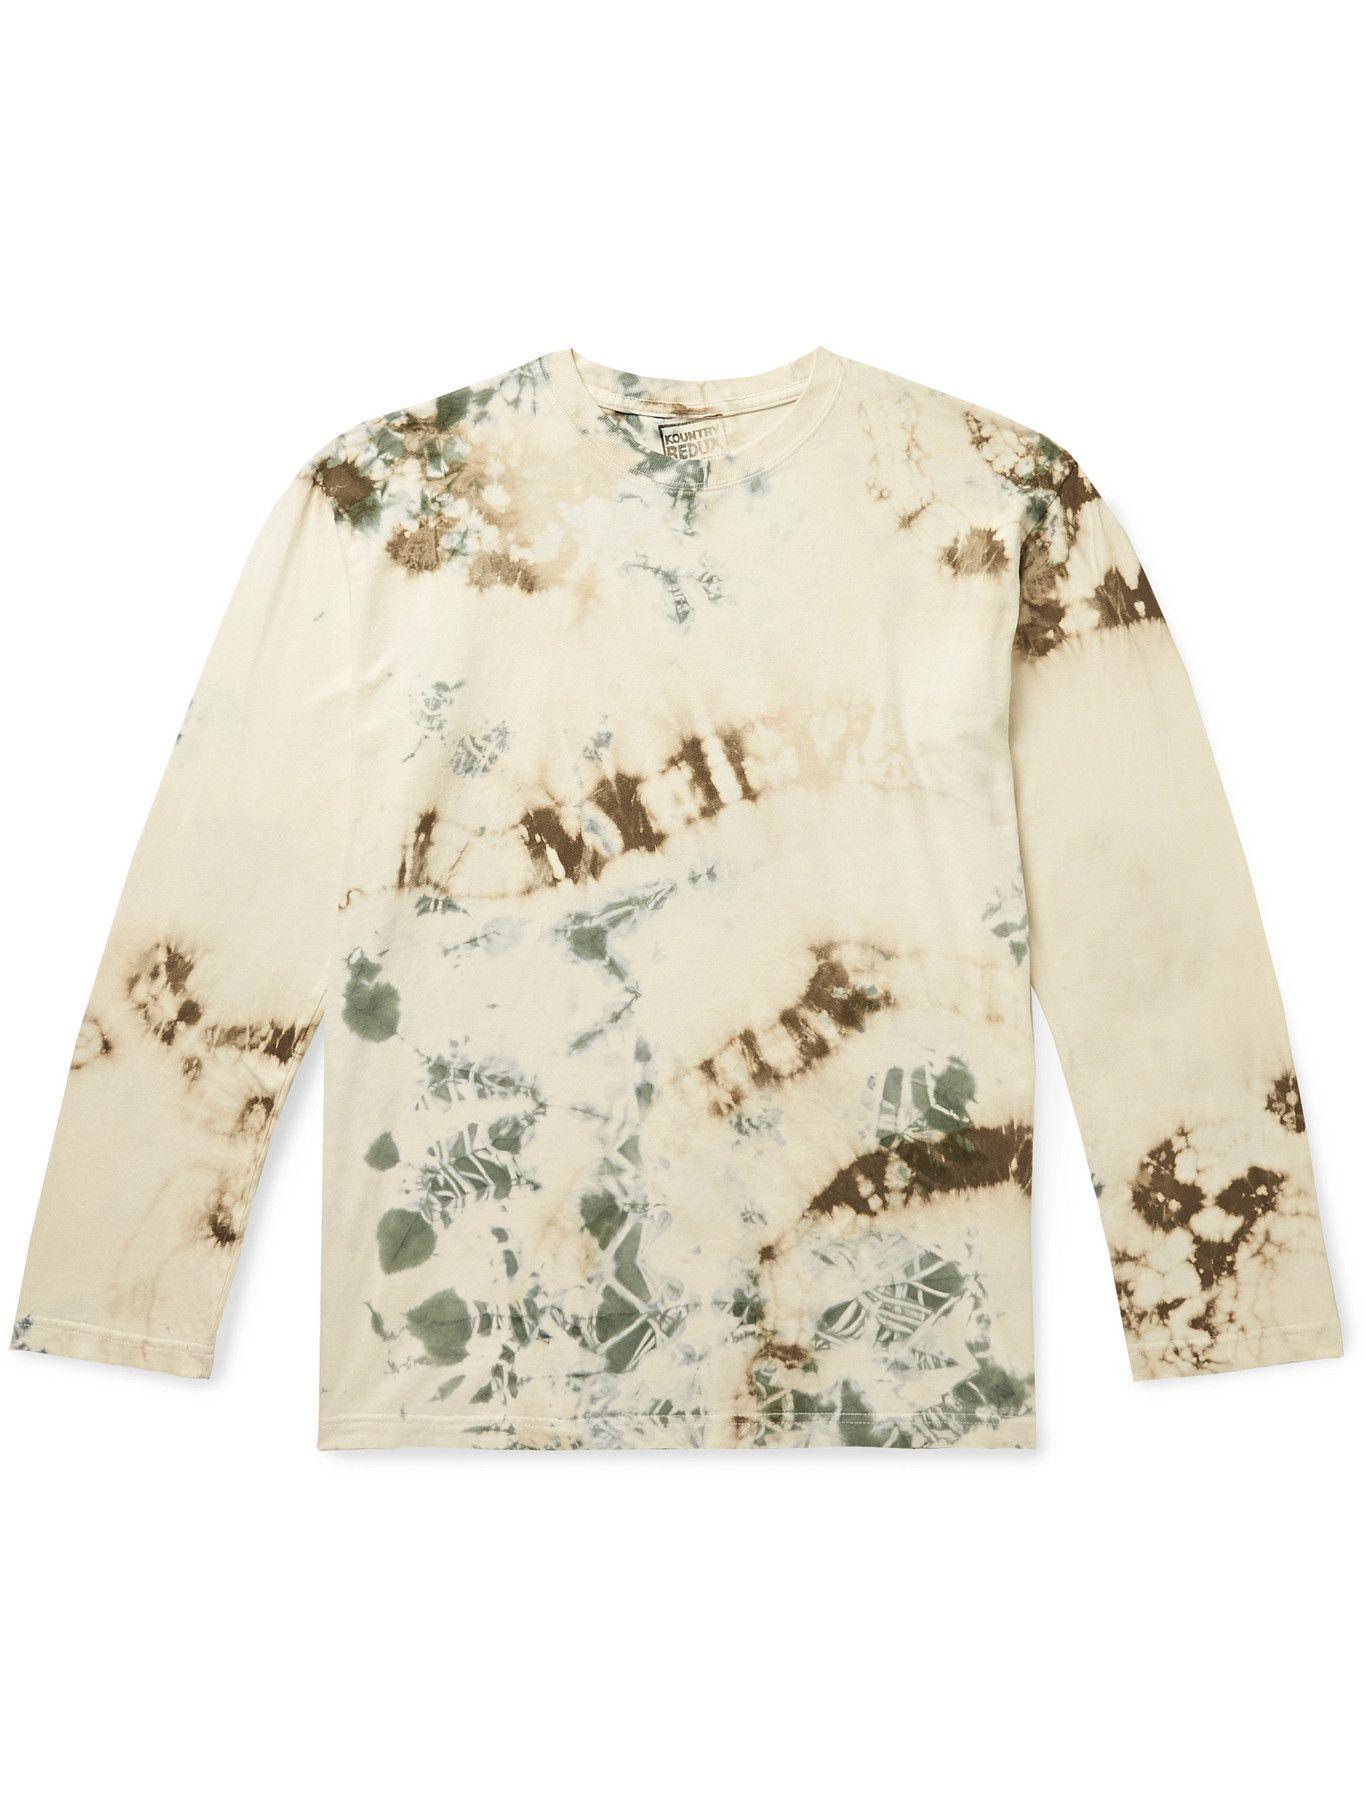 Photo: KAPITAL - Printed Tie-Dyed Cotton-Jersey T-Shirt - Multi